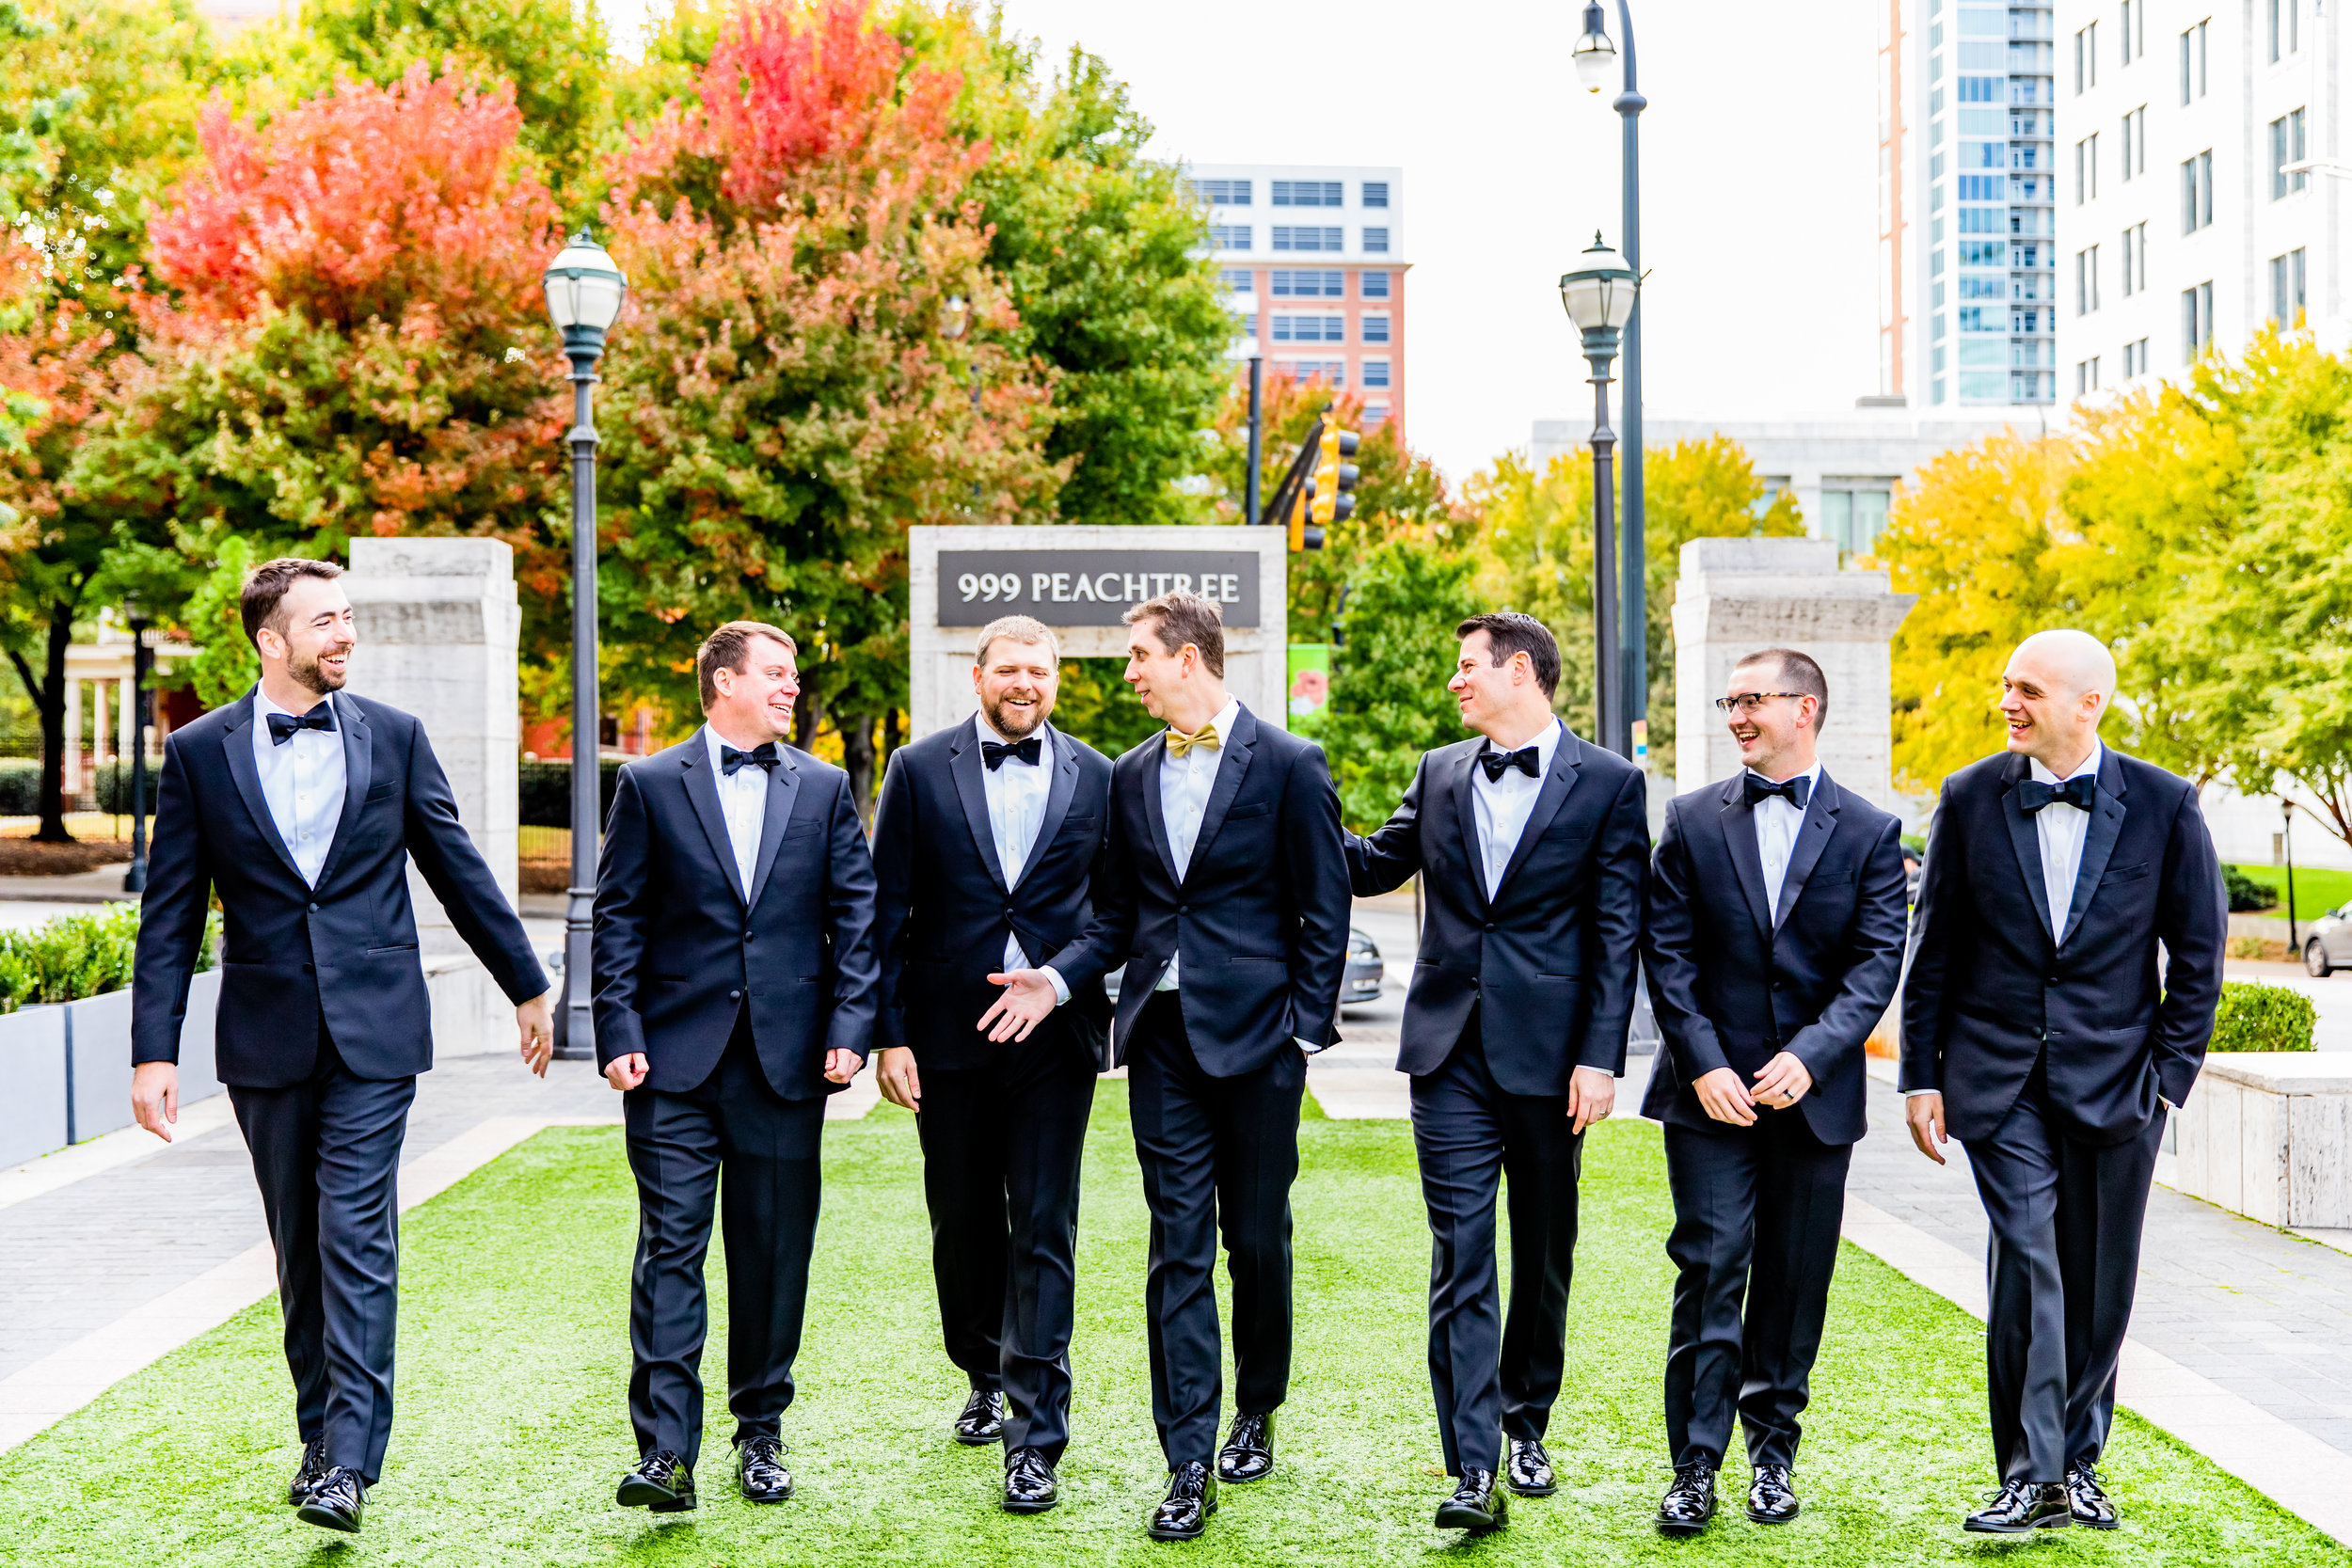 Wedding_Atlanta_Emily_Lester_Photography-419.jpg